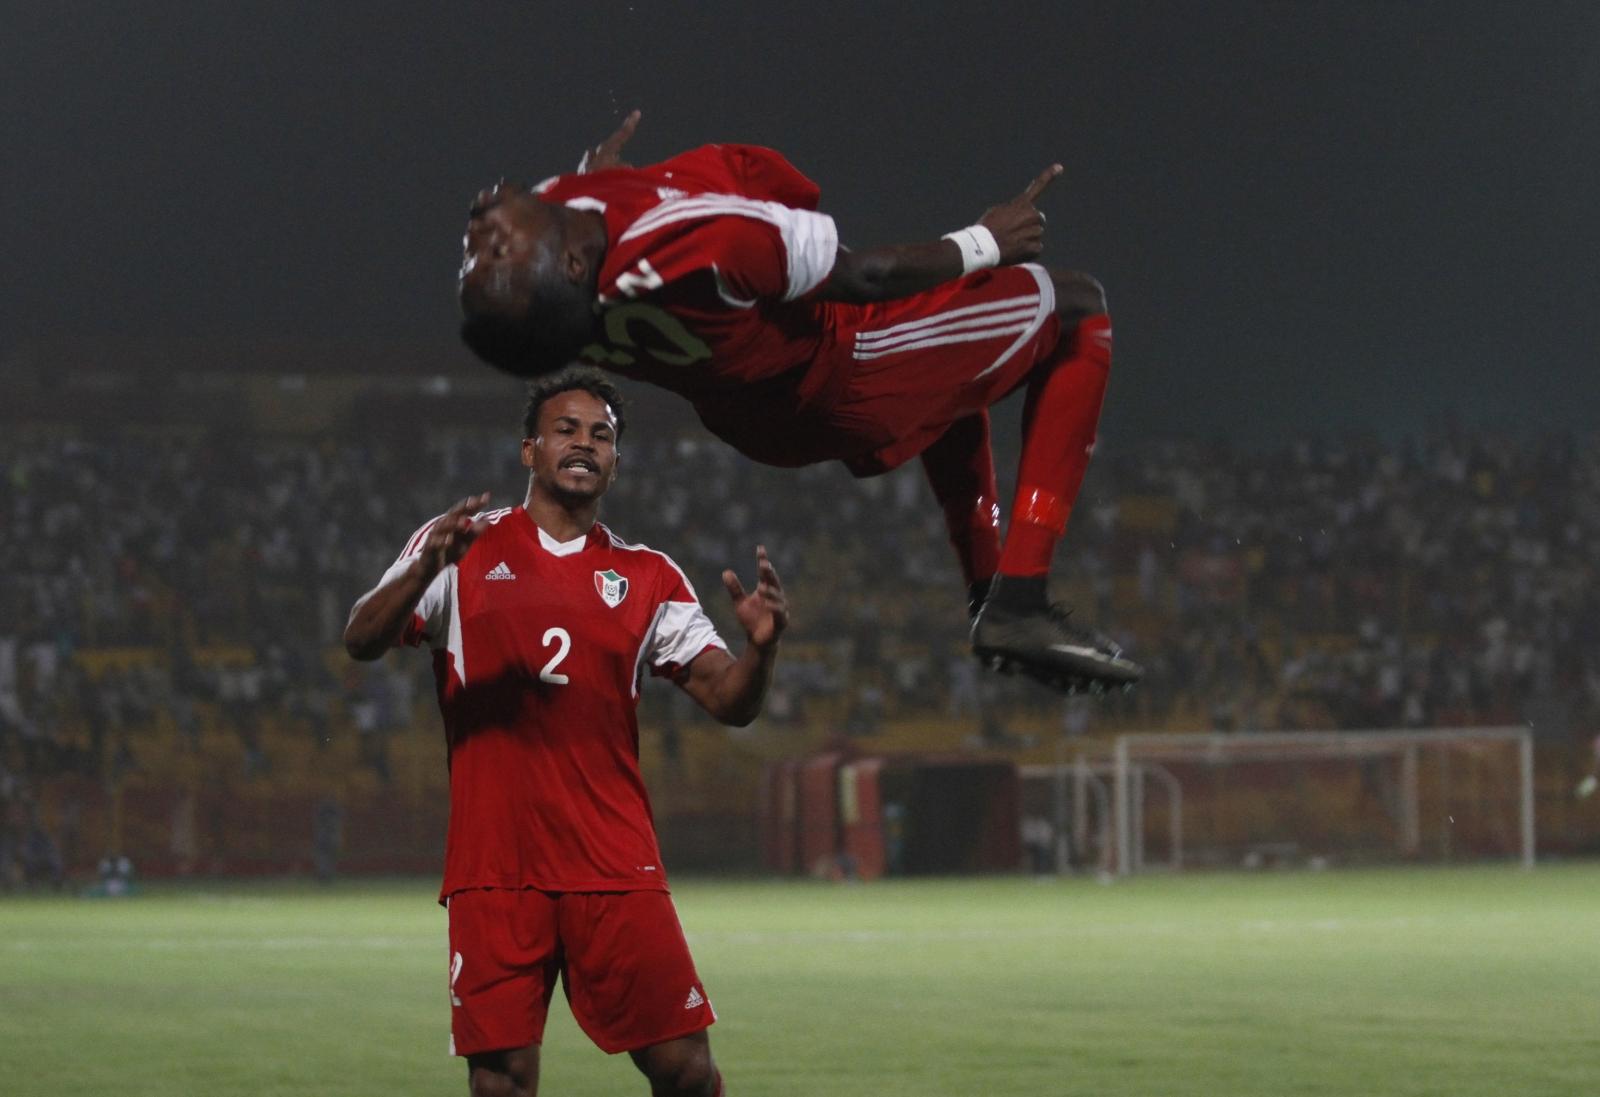 Muhannad El Tahir